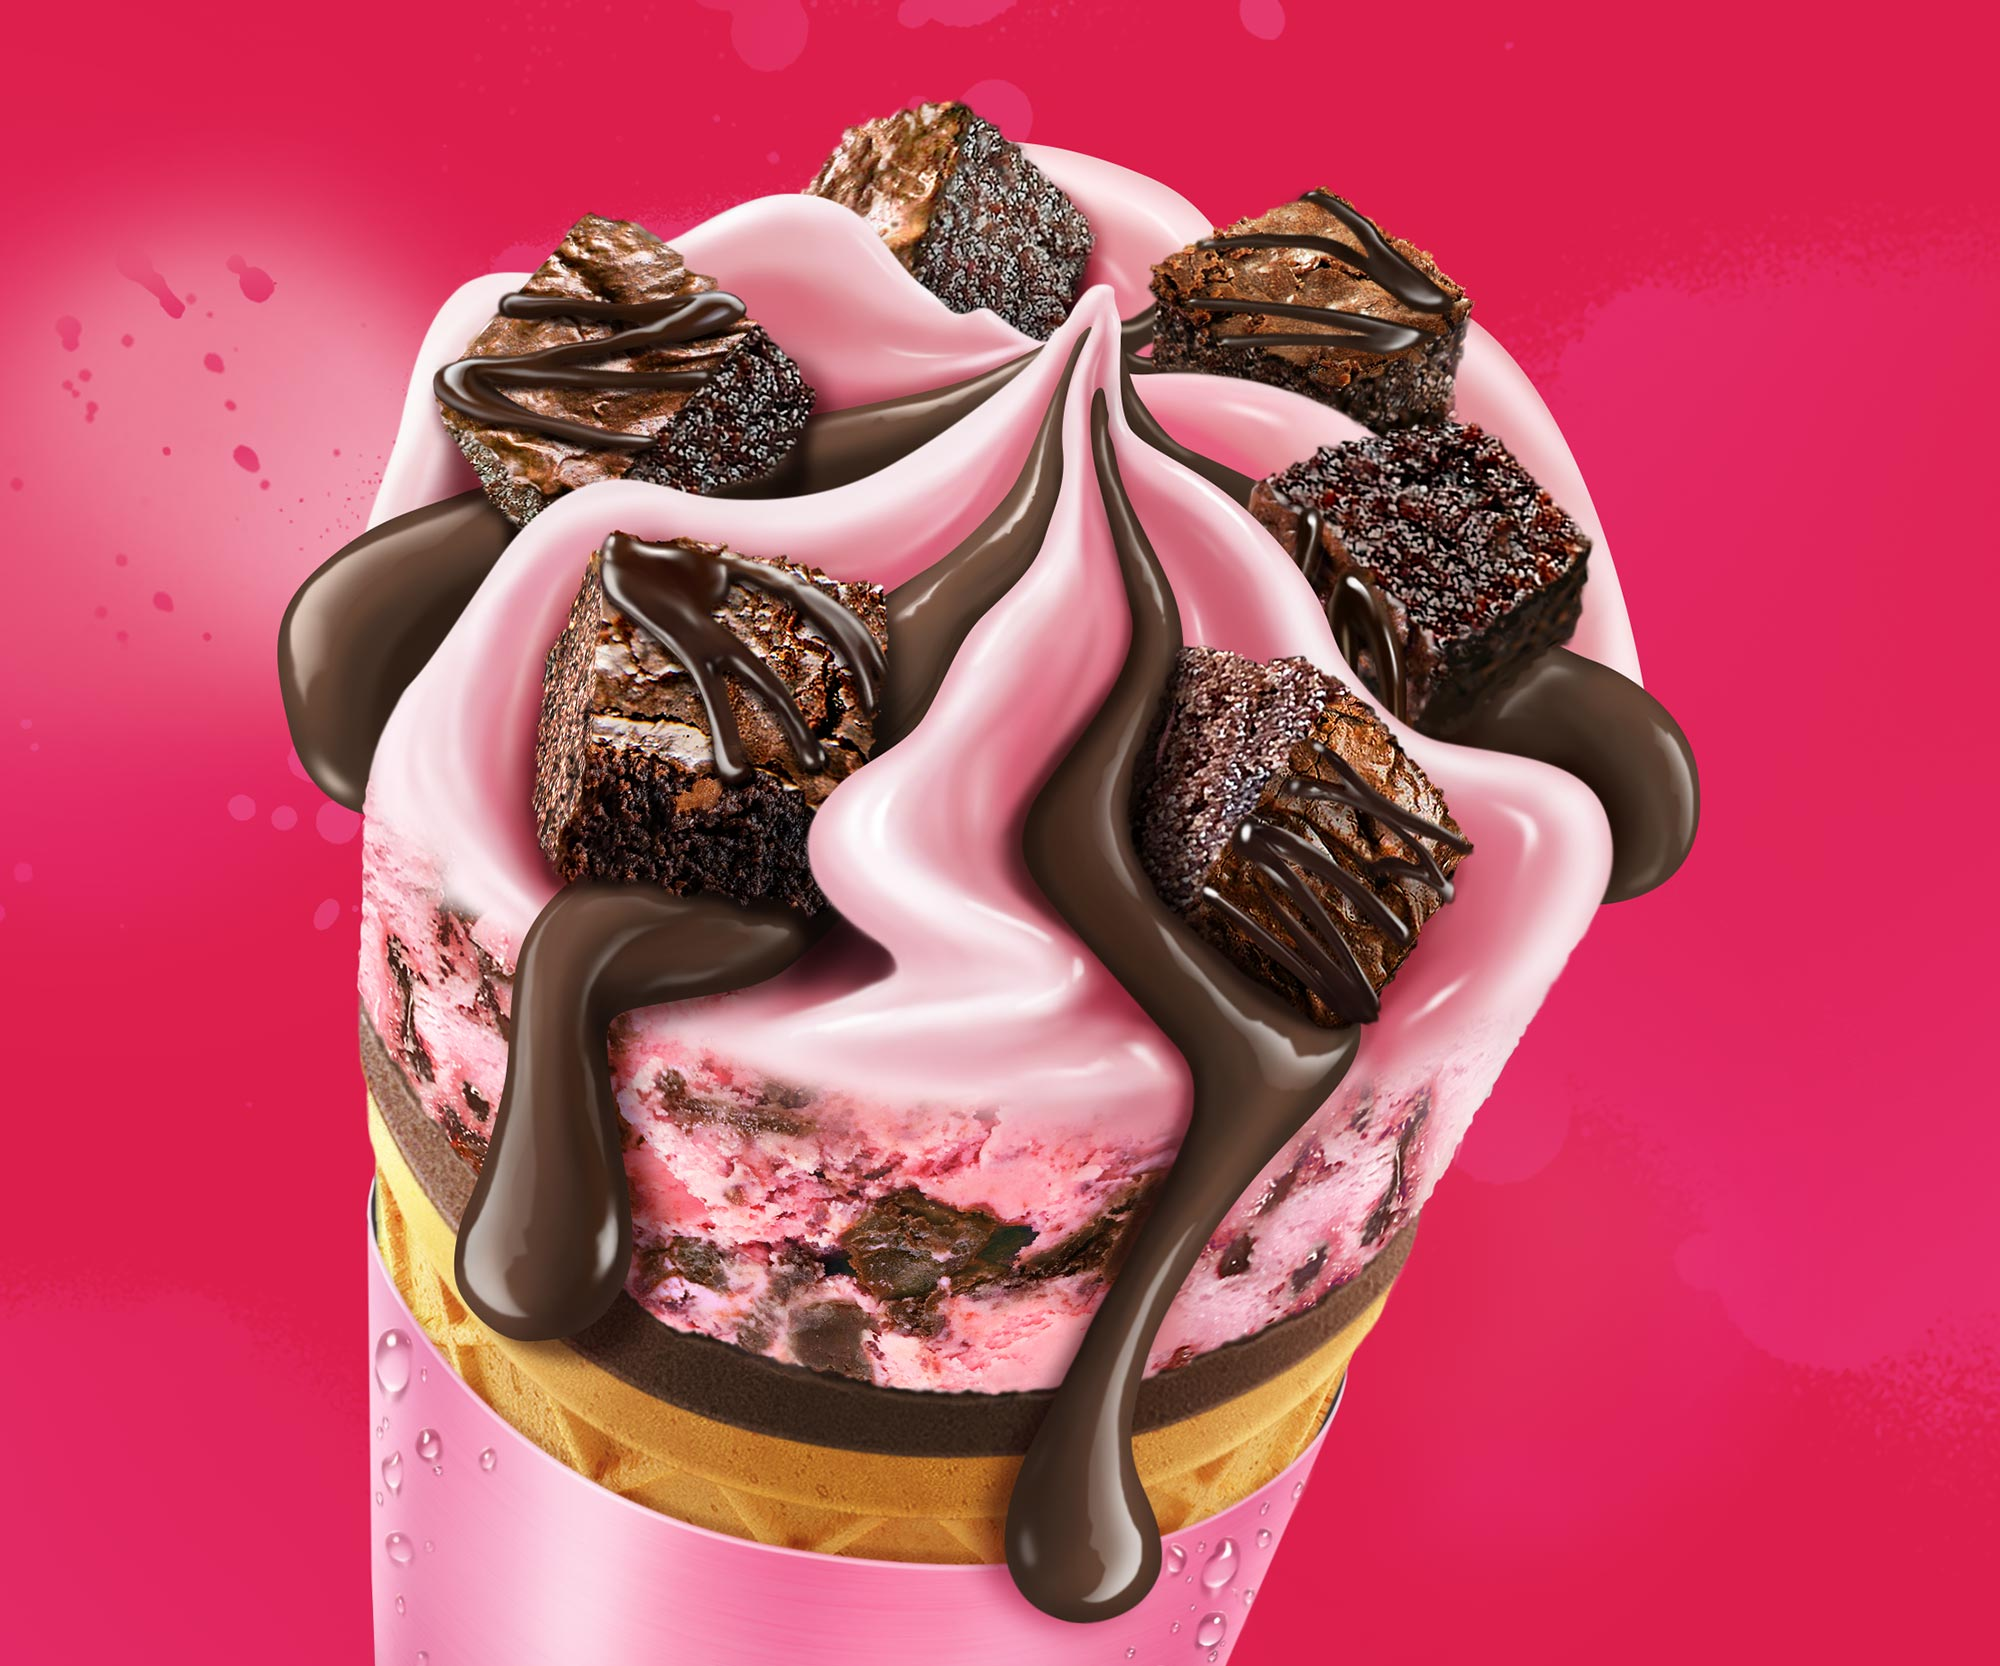 Nestle Ice Cream Strawberry Chocfudge Cone Illustration